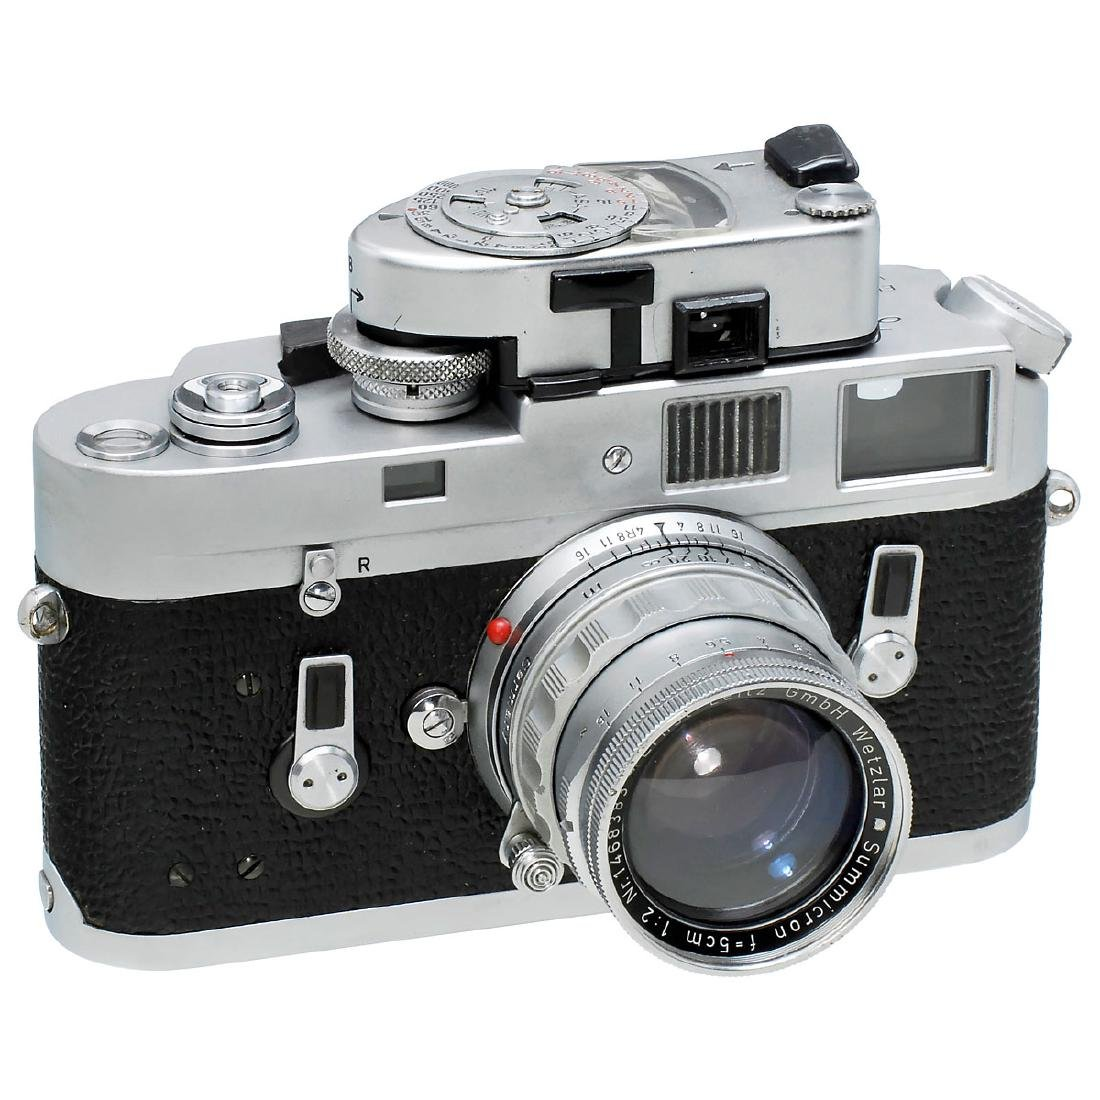 Leica M4 with Summicron 2/5 cm, 1968